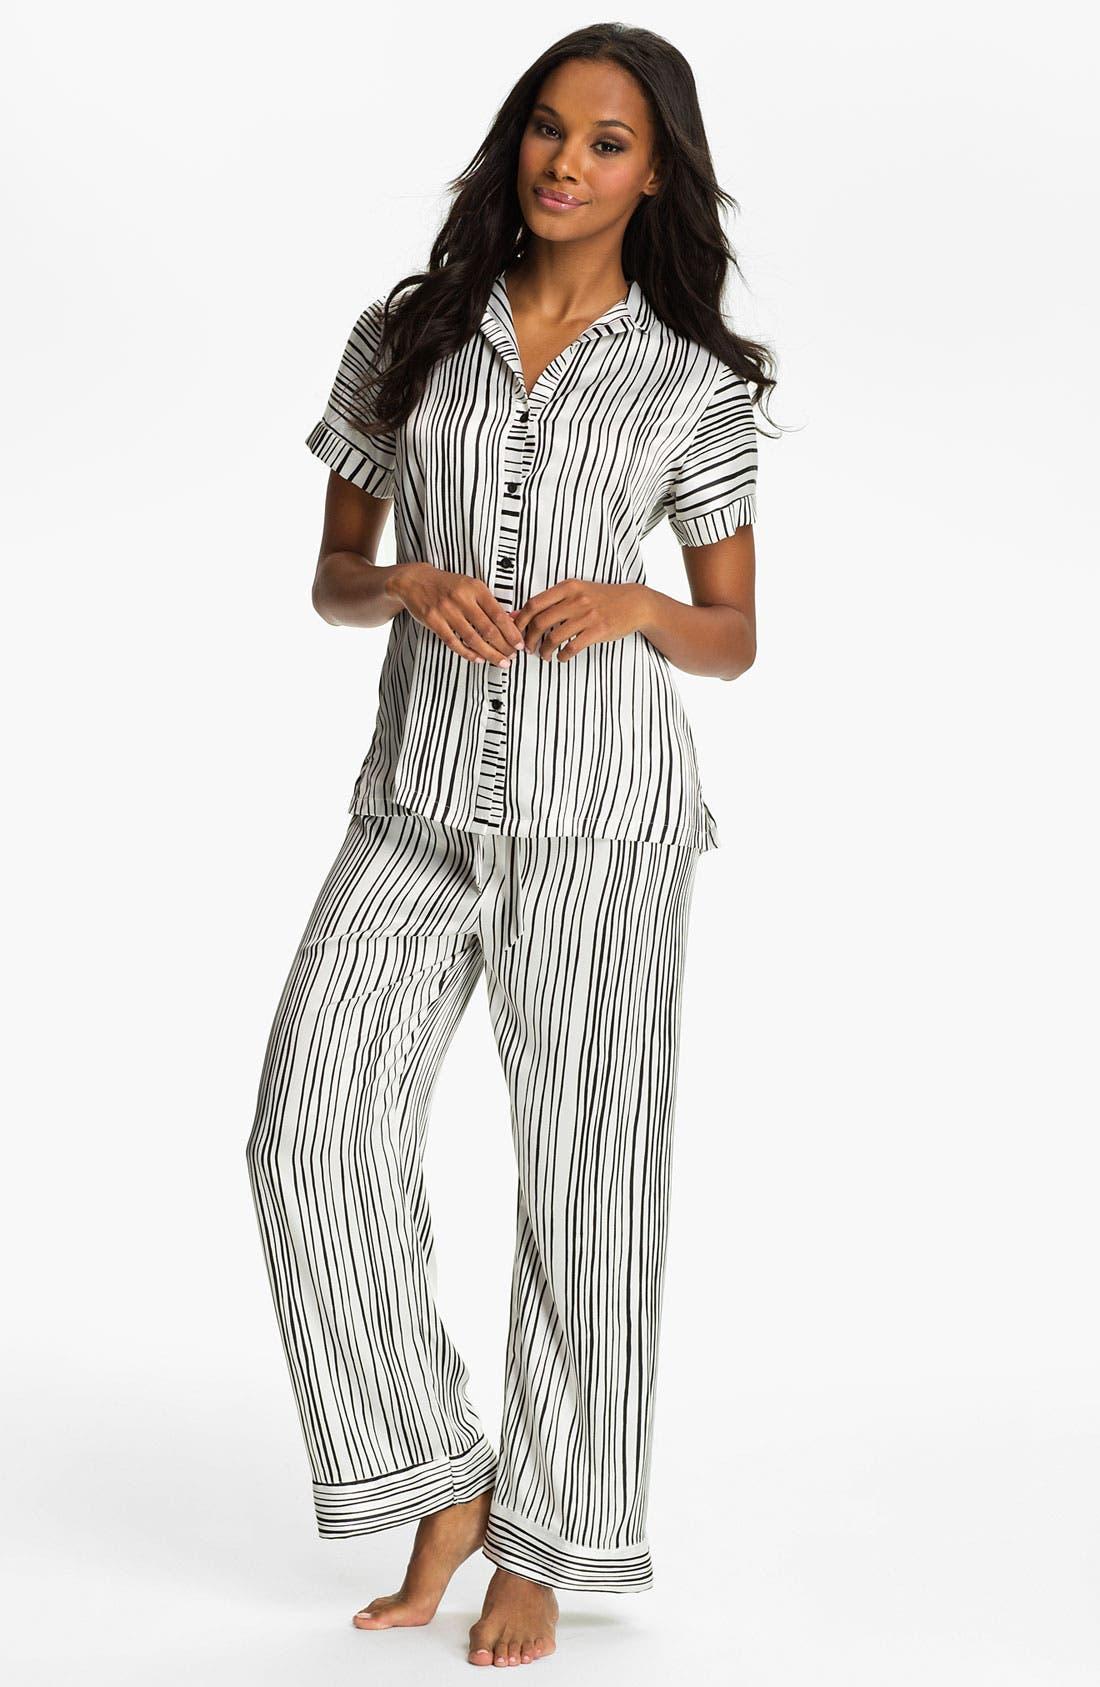 Alternate Image 1 Selected - Oscar de la Renta Sleepwear Stripe Charmeuse Pajamas